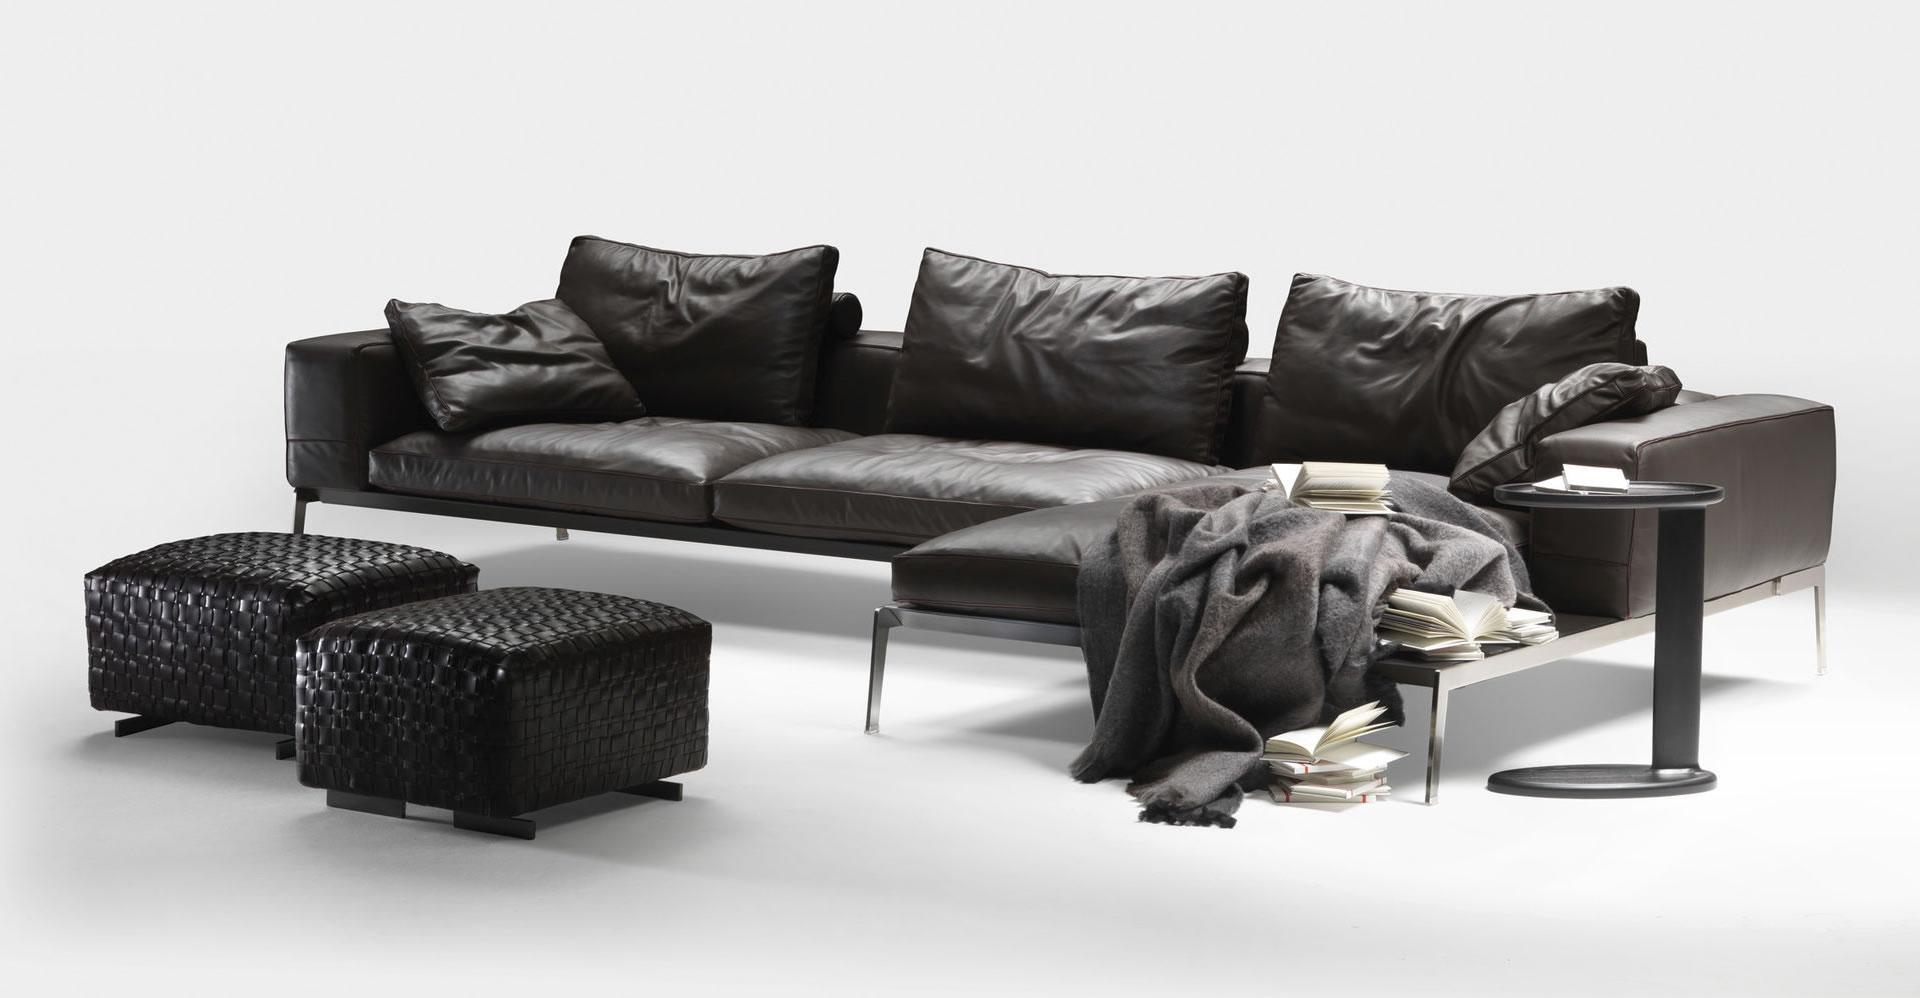 Swell Lifesteel Flexform Sofa Lifesteel Flexform Pdpeps Interior Chair Design Pdpepsorg